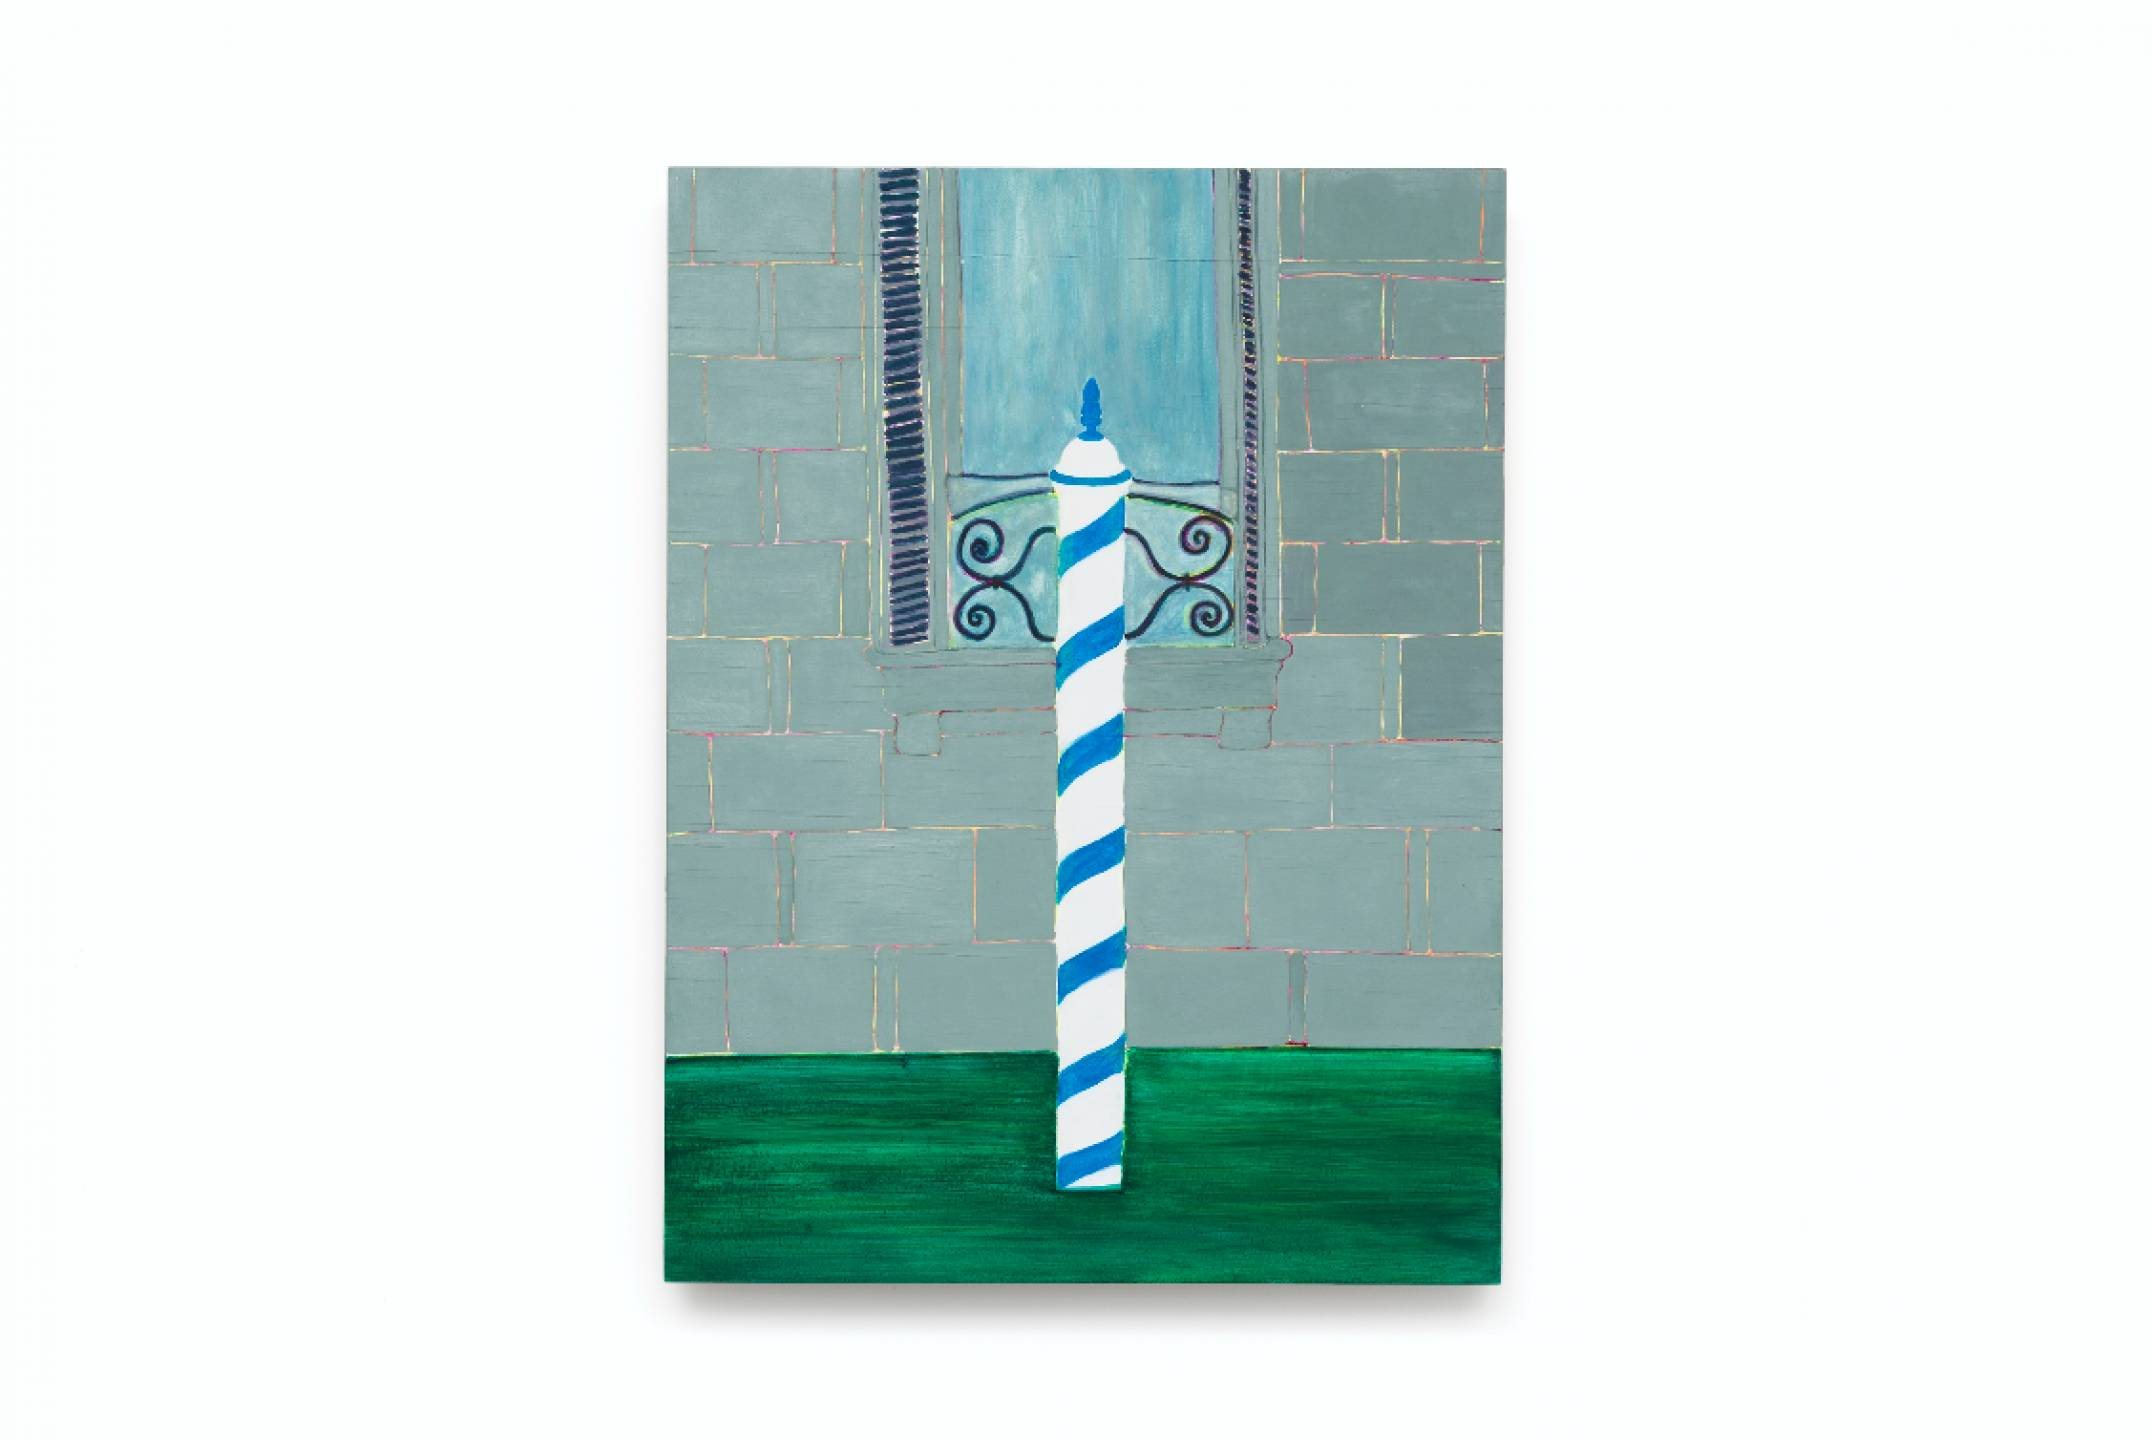 Patricia Leite,<em>untitled, from Veneza series,</em>2015, oil on wood, 40 ×30 cm - Mendes Wood DM